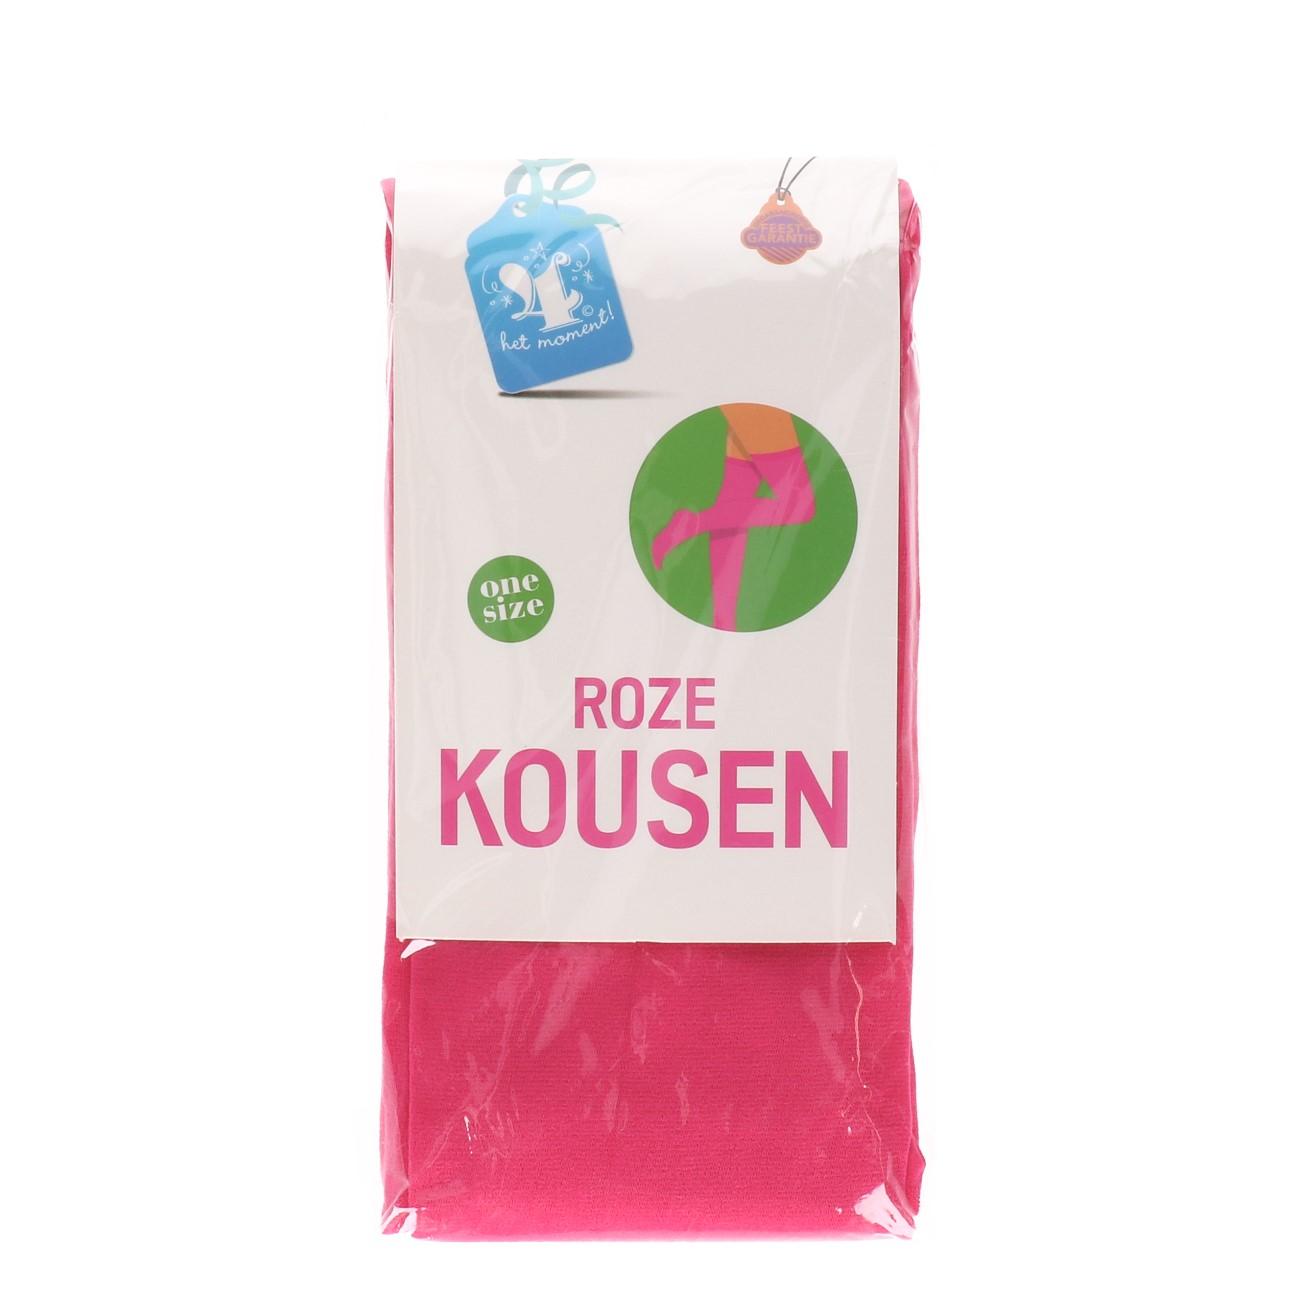 Kousen roze one size